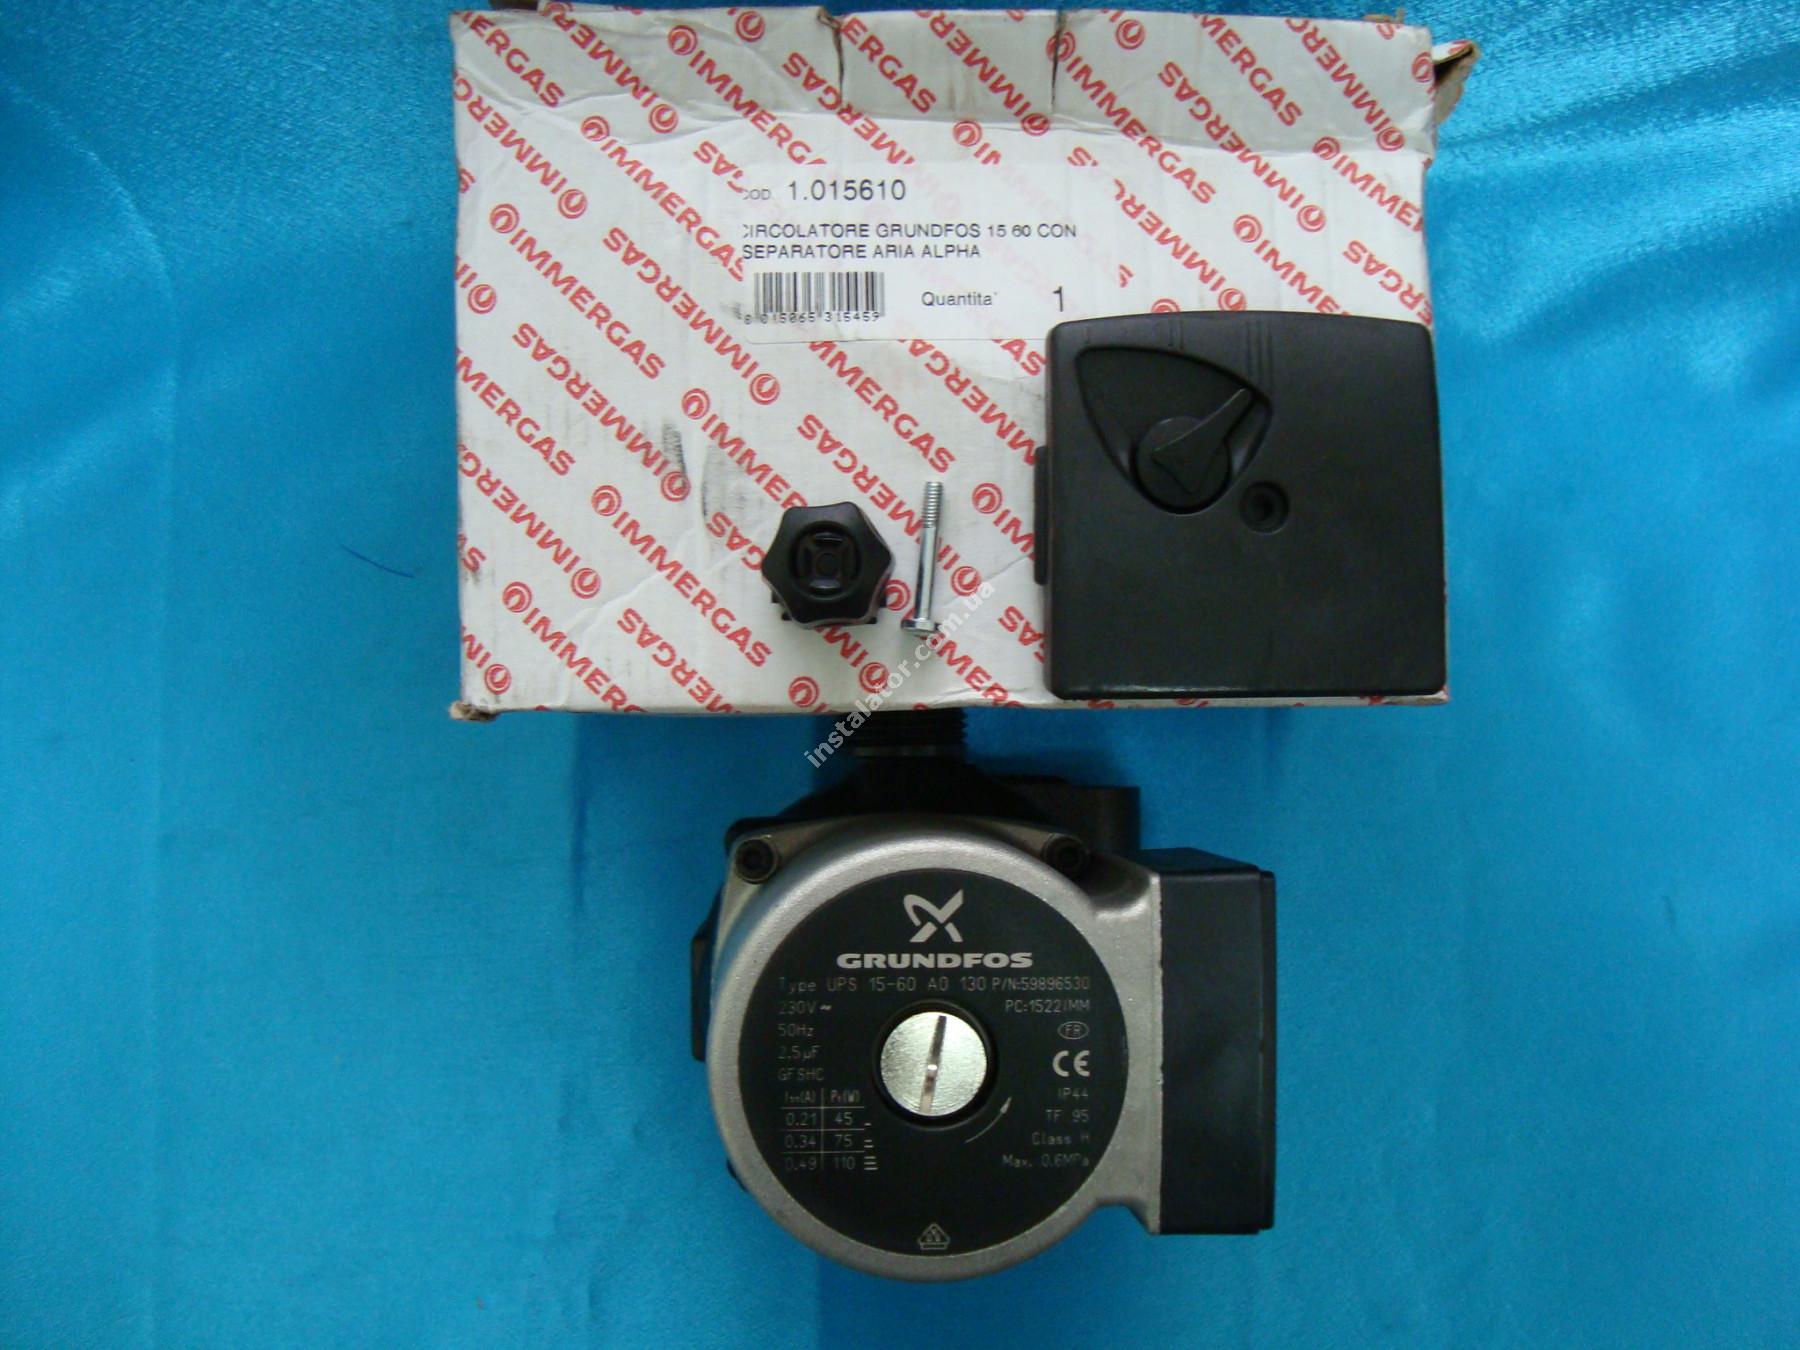 1.015610 Циркуляційний насос Grundfos UPS 15/60 IMMERGAS full-image-3